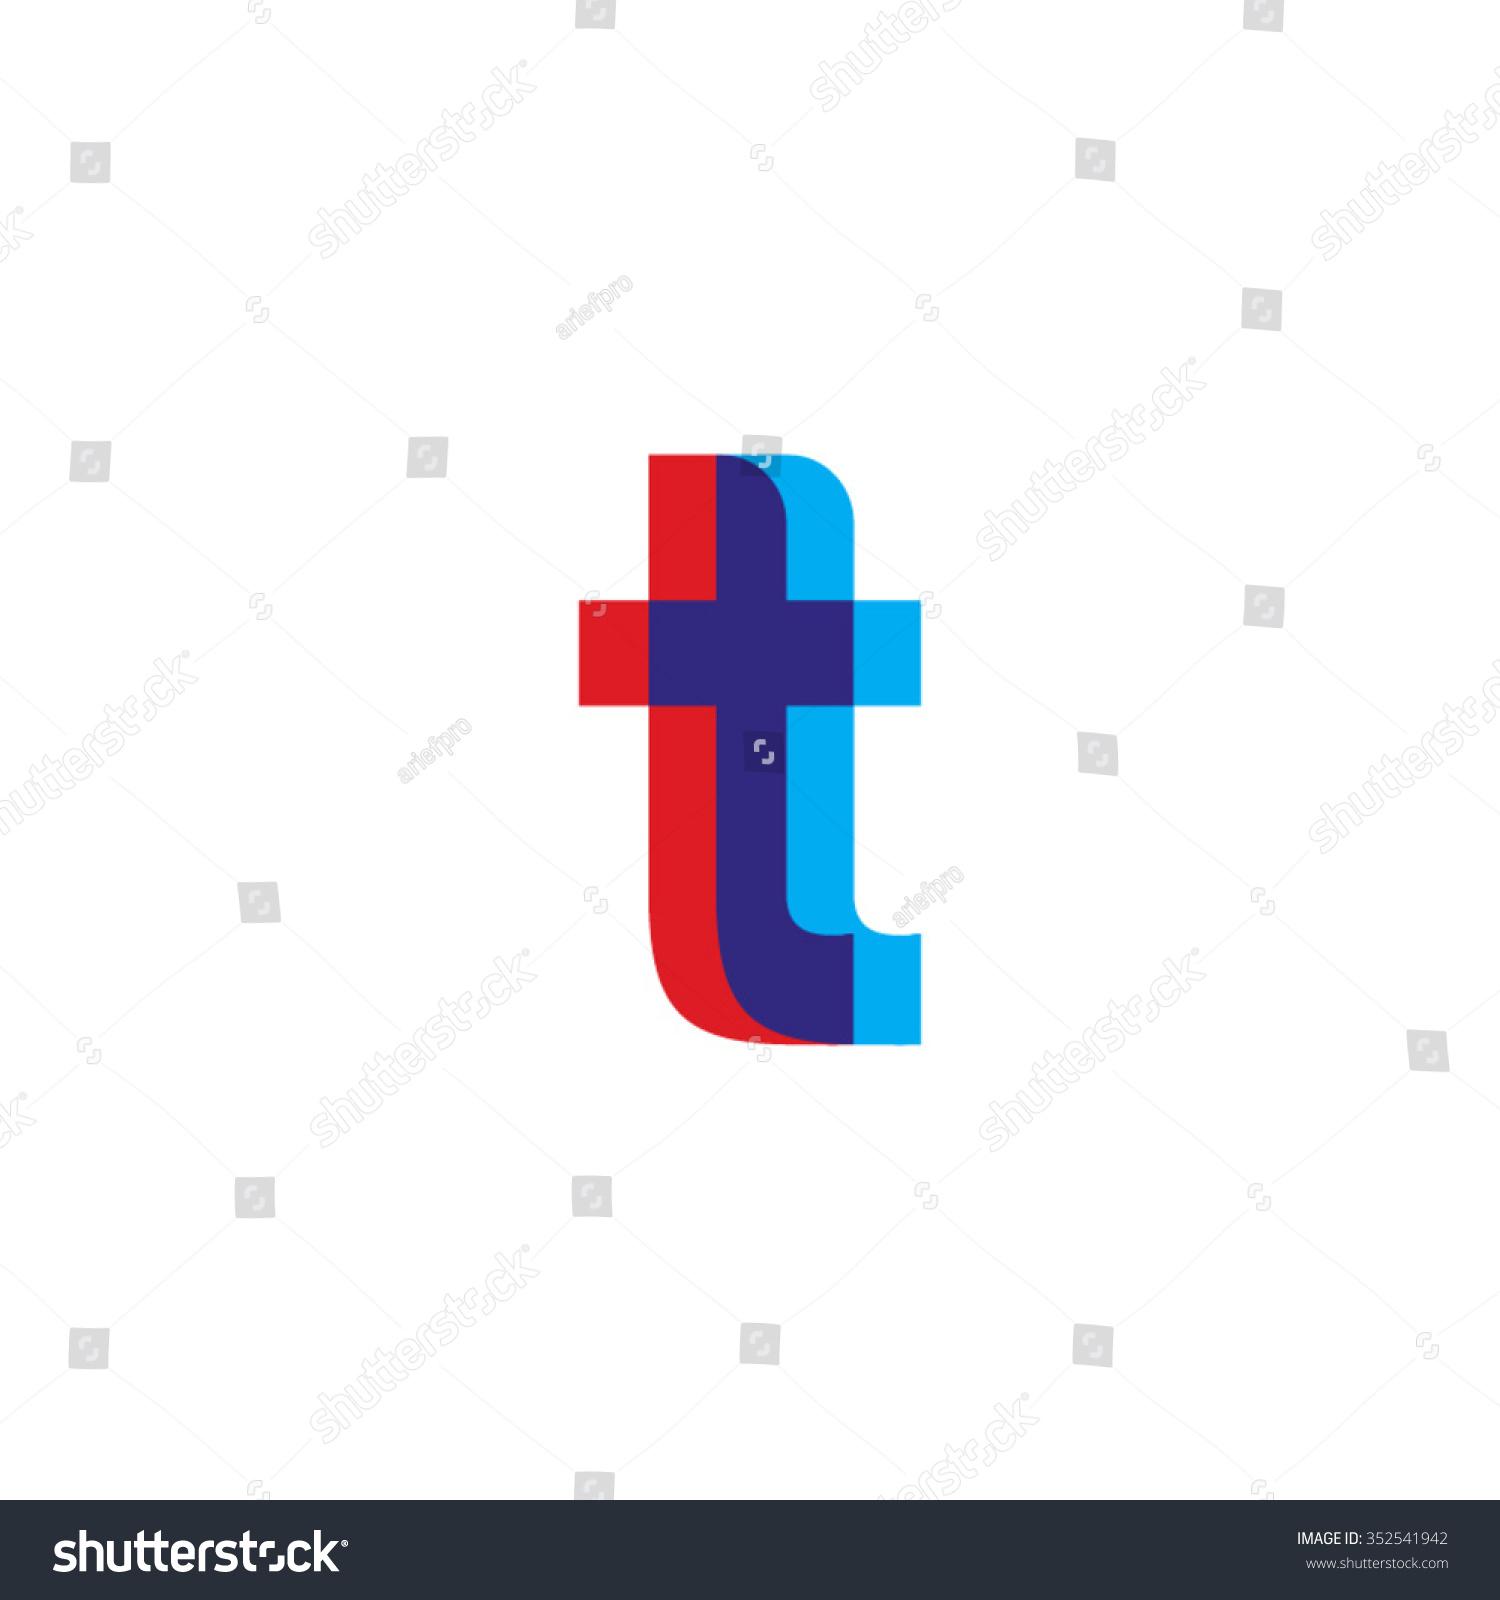 Tj initial luxury ornament monogram logo stock vector - Lowercase Tt Logo Red Blue Overlap Transparent Logo